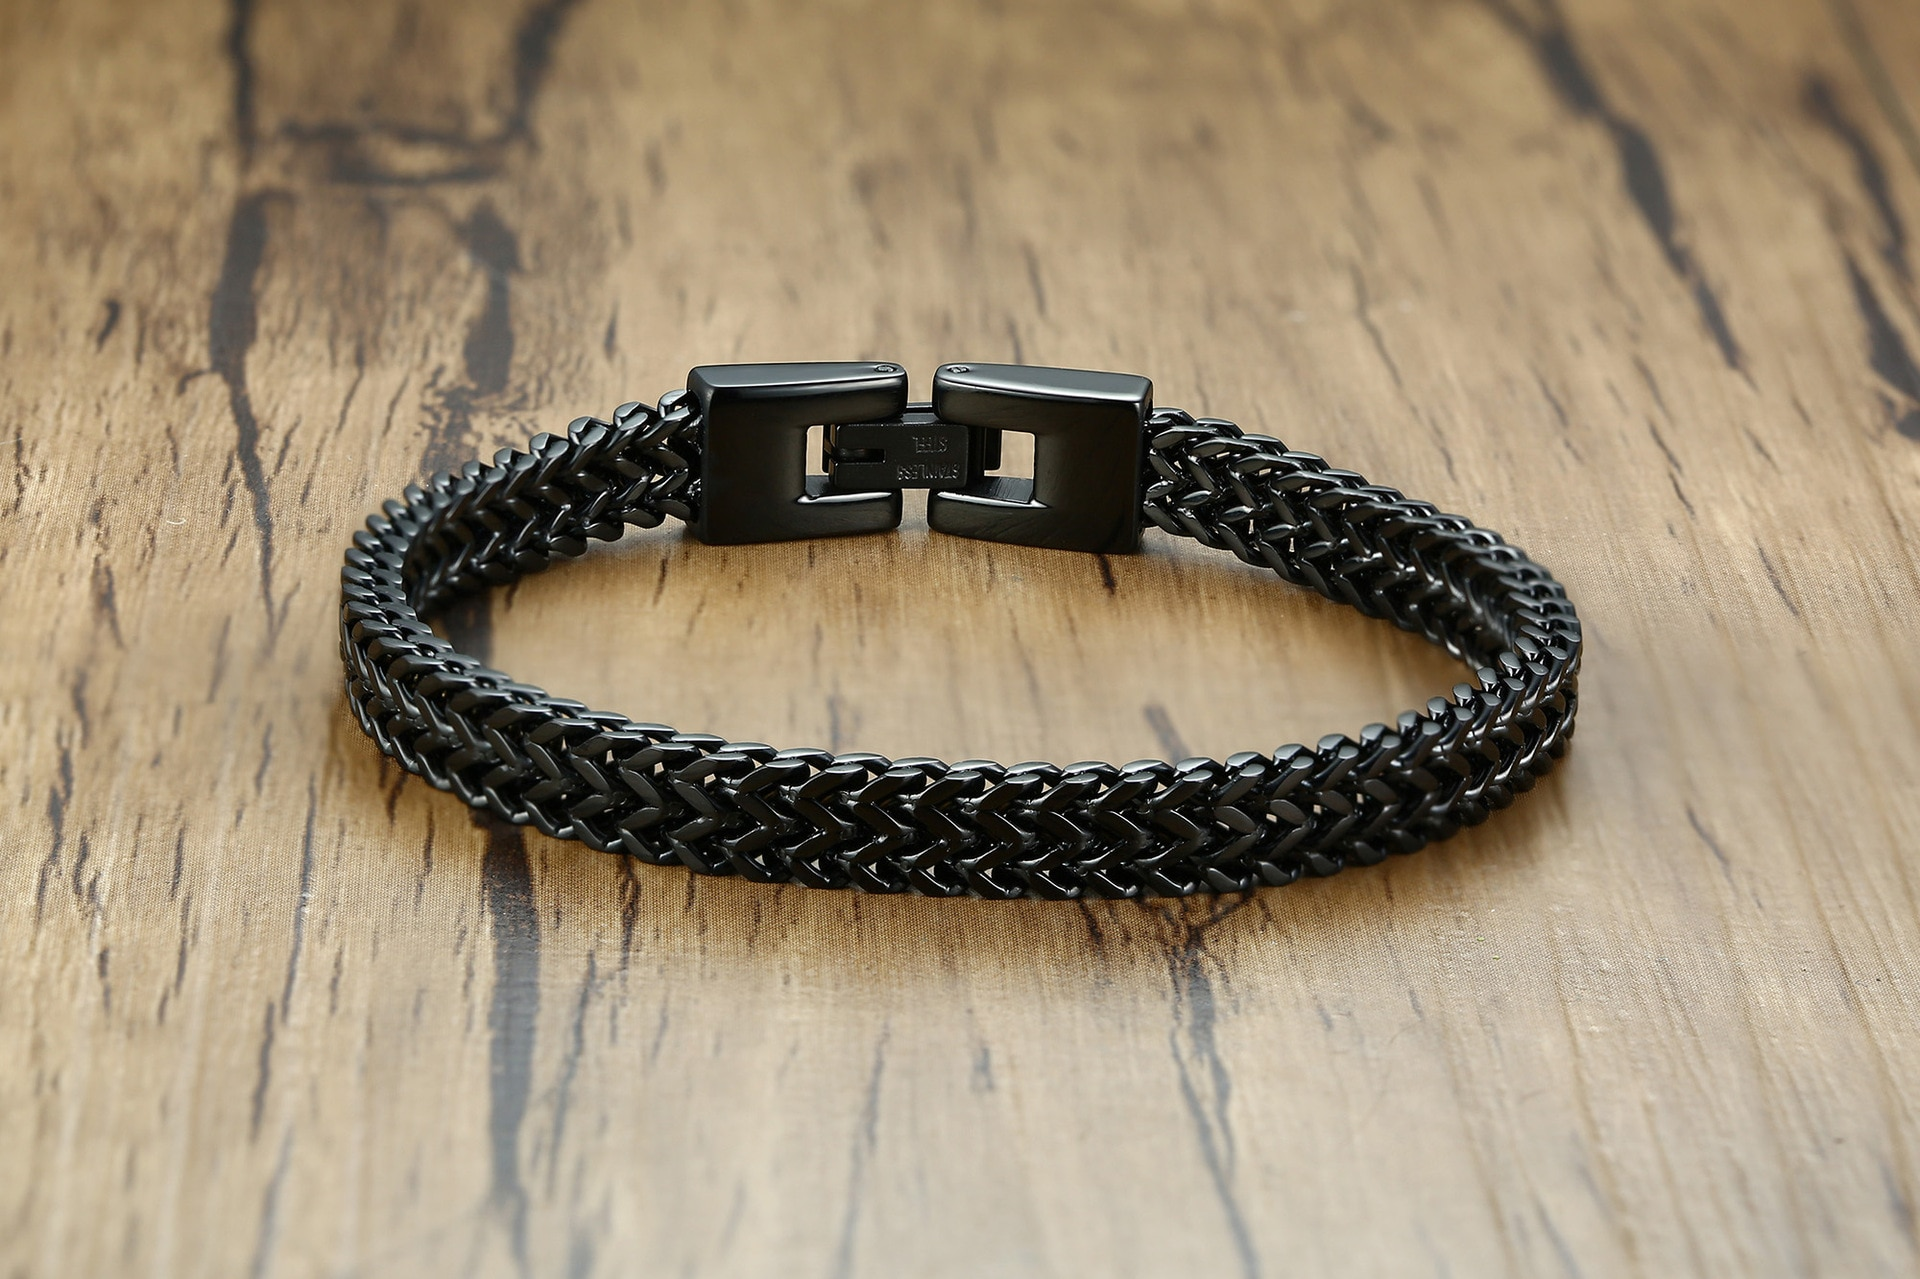 2020Hip Hop Accessories Men's Chakra Charm Stainless Steel Keel Chain Bracelet Steel Male Style European Style Asian Accessories